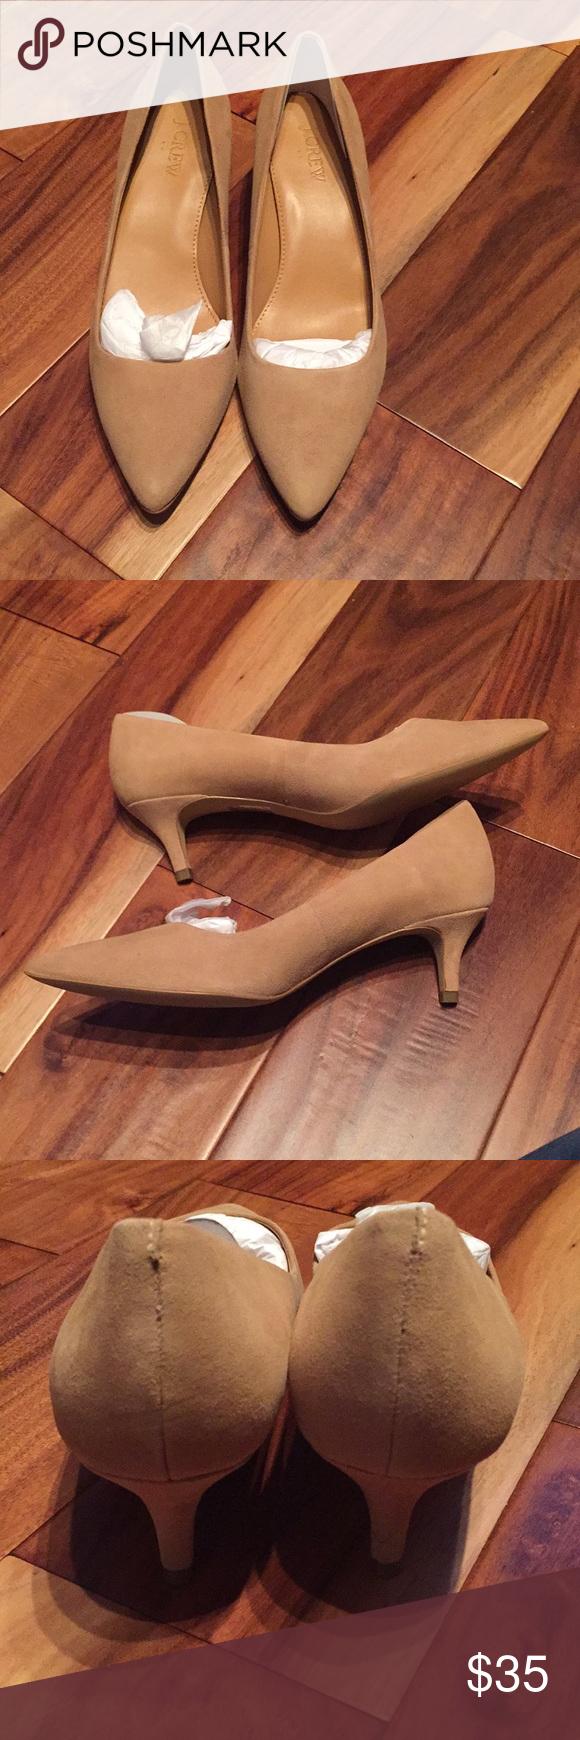 6d0351be9b9 J. Crew Factory Esme suede kitten heels Brand new